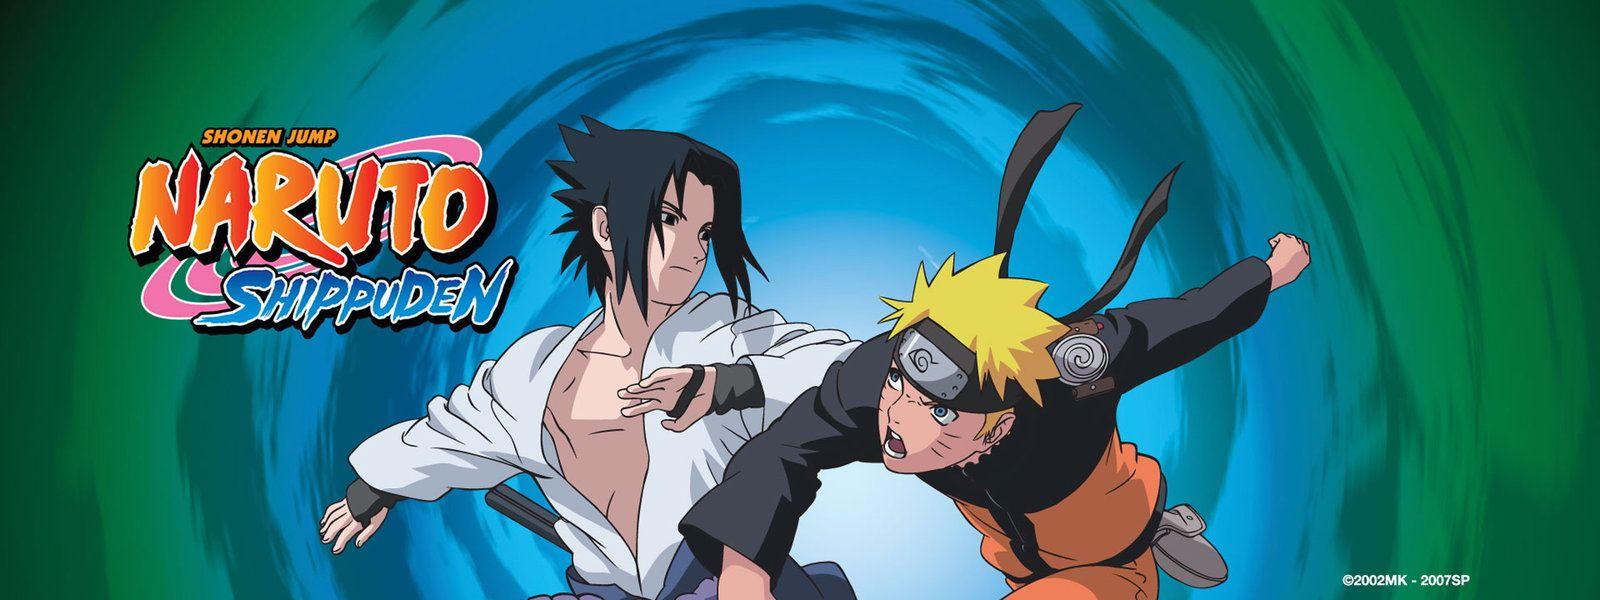 Watch Naruto Shippuden online Hulu Plus Watch naruto